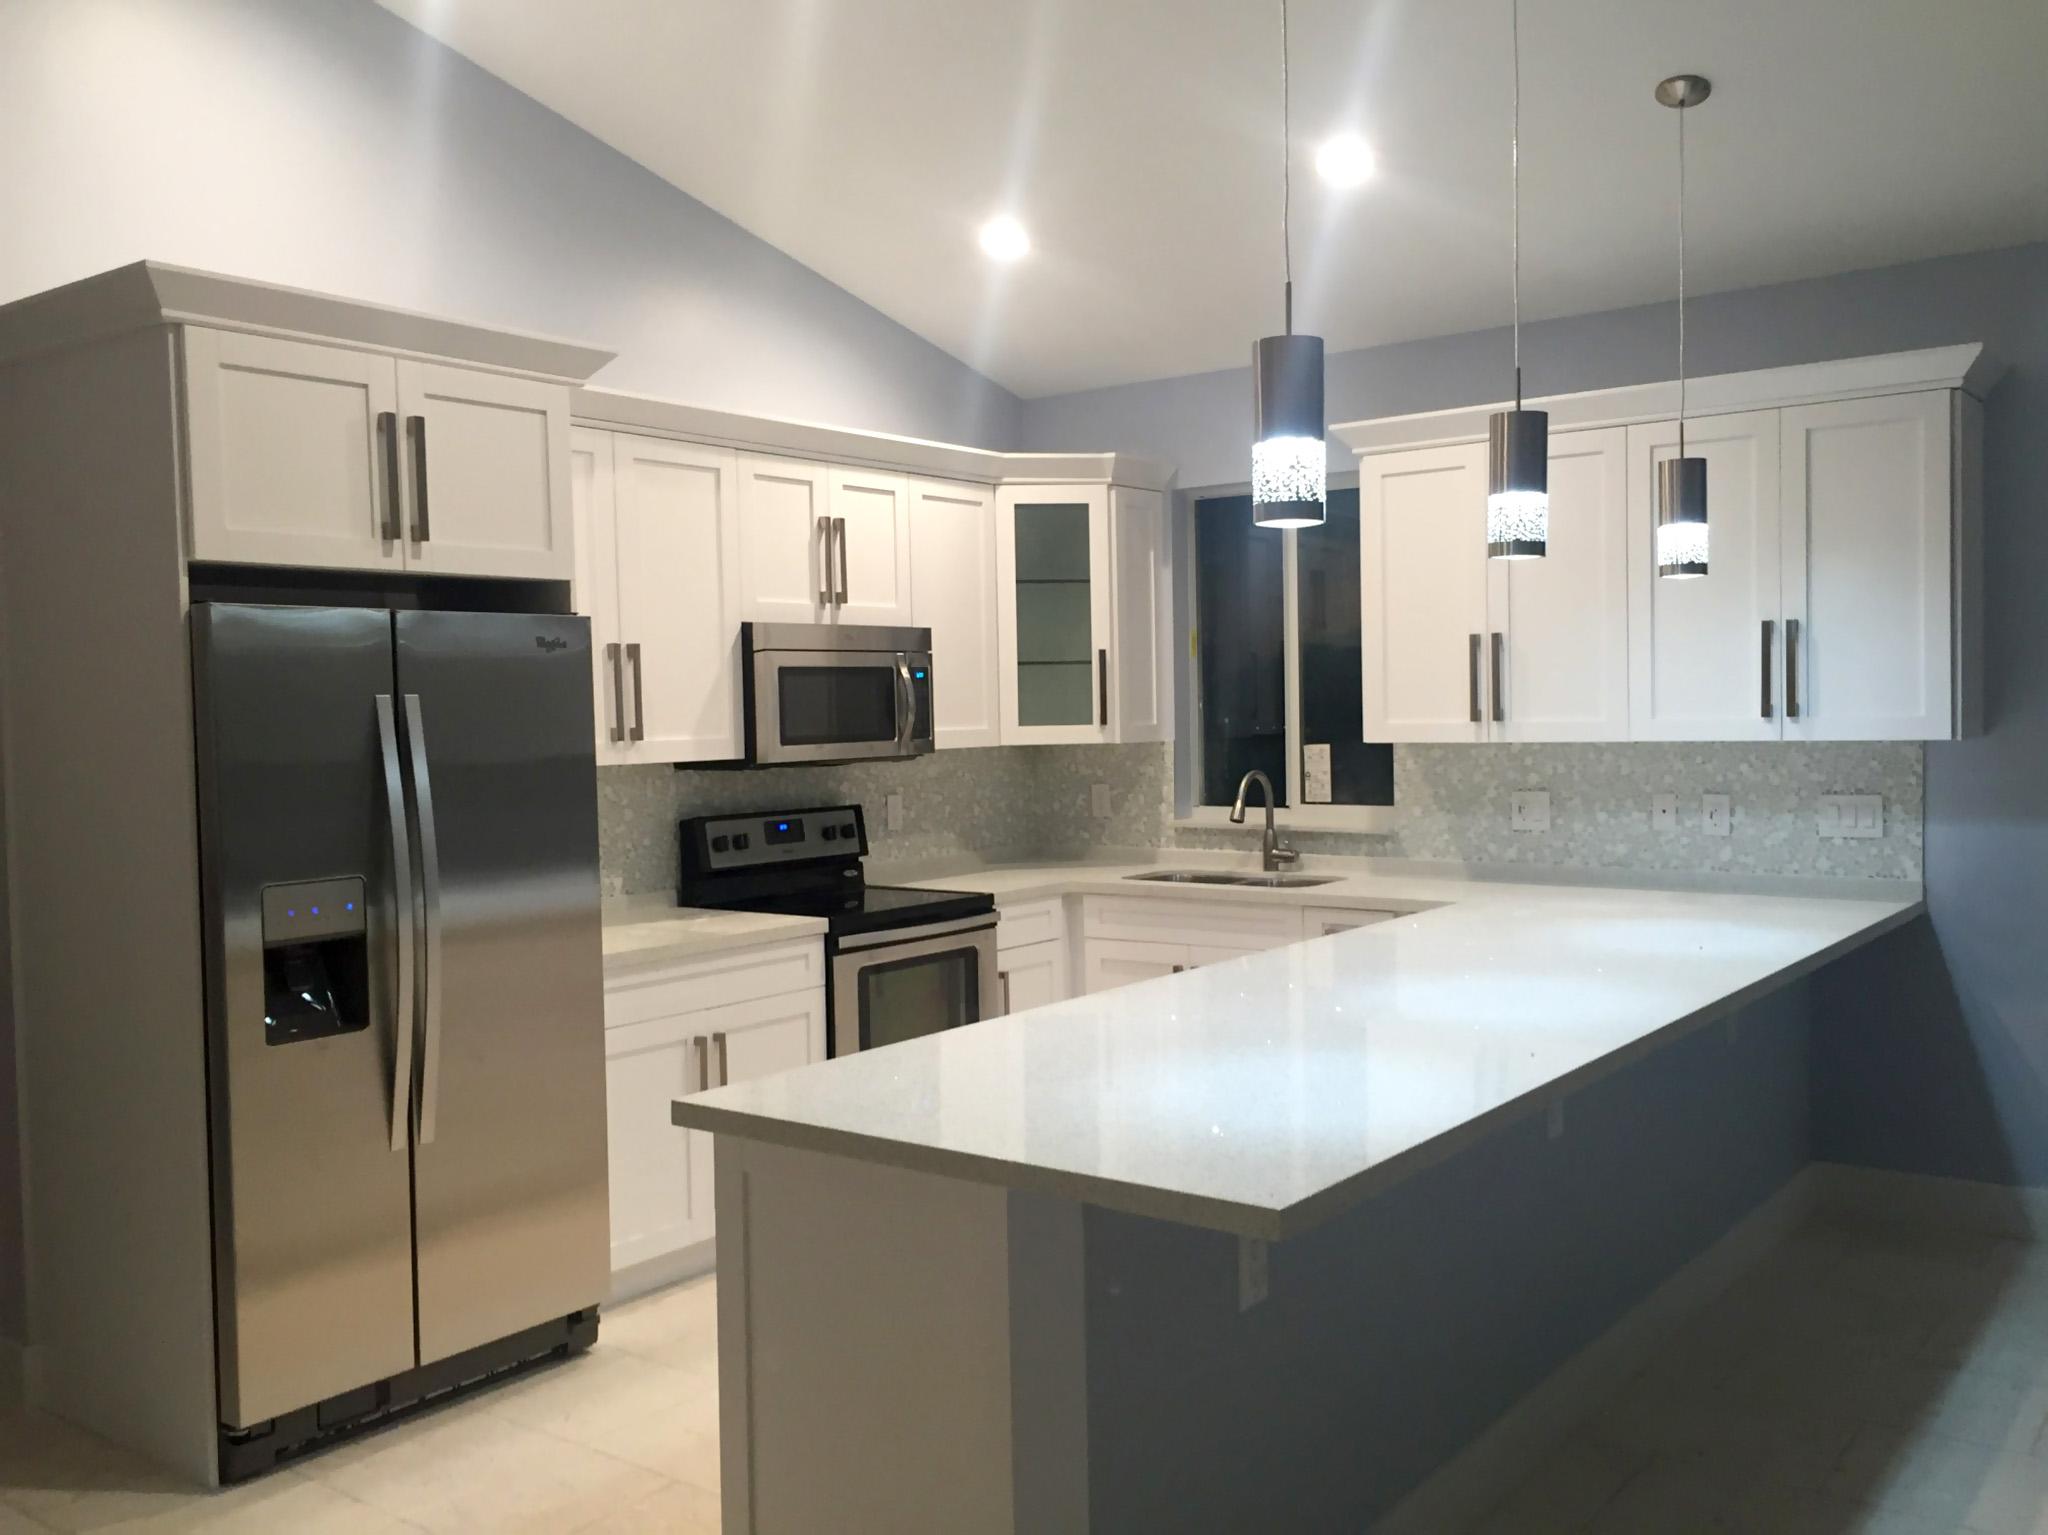 Key Largo Kitchen With White Shaker Cabinets